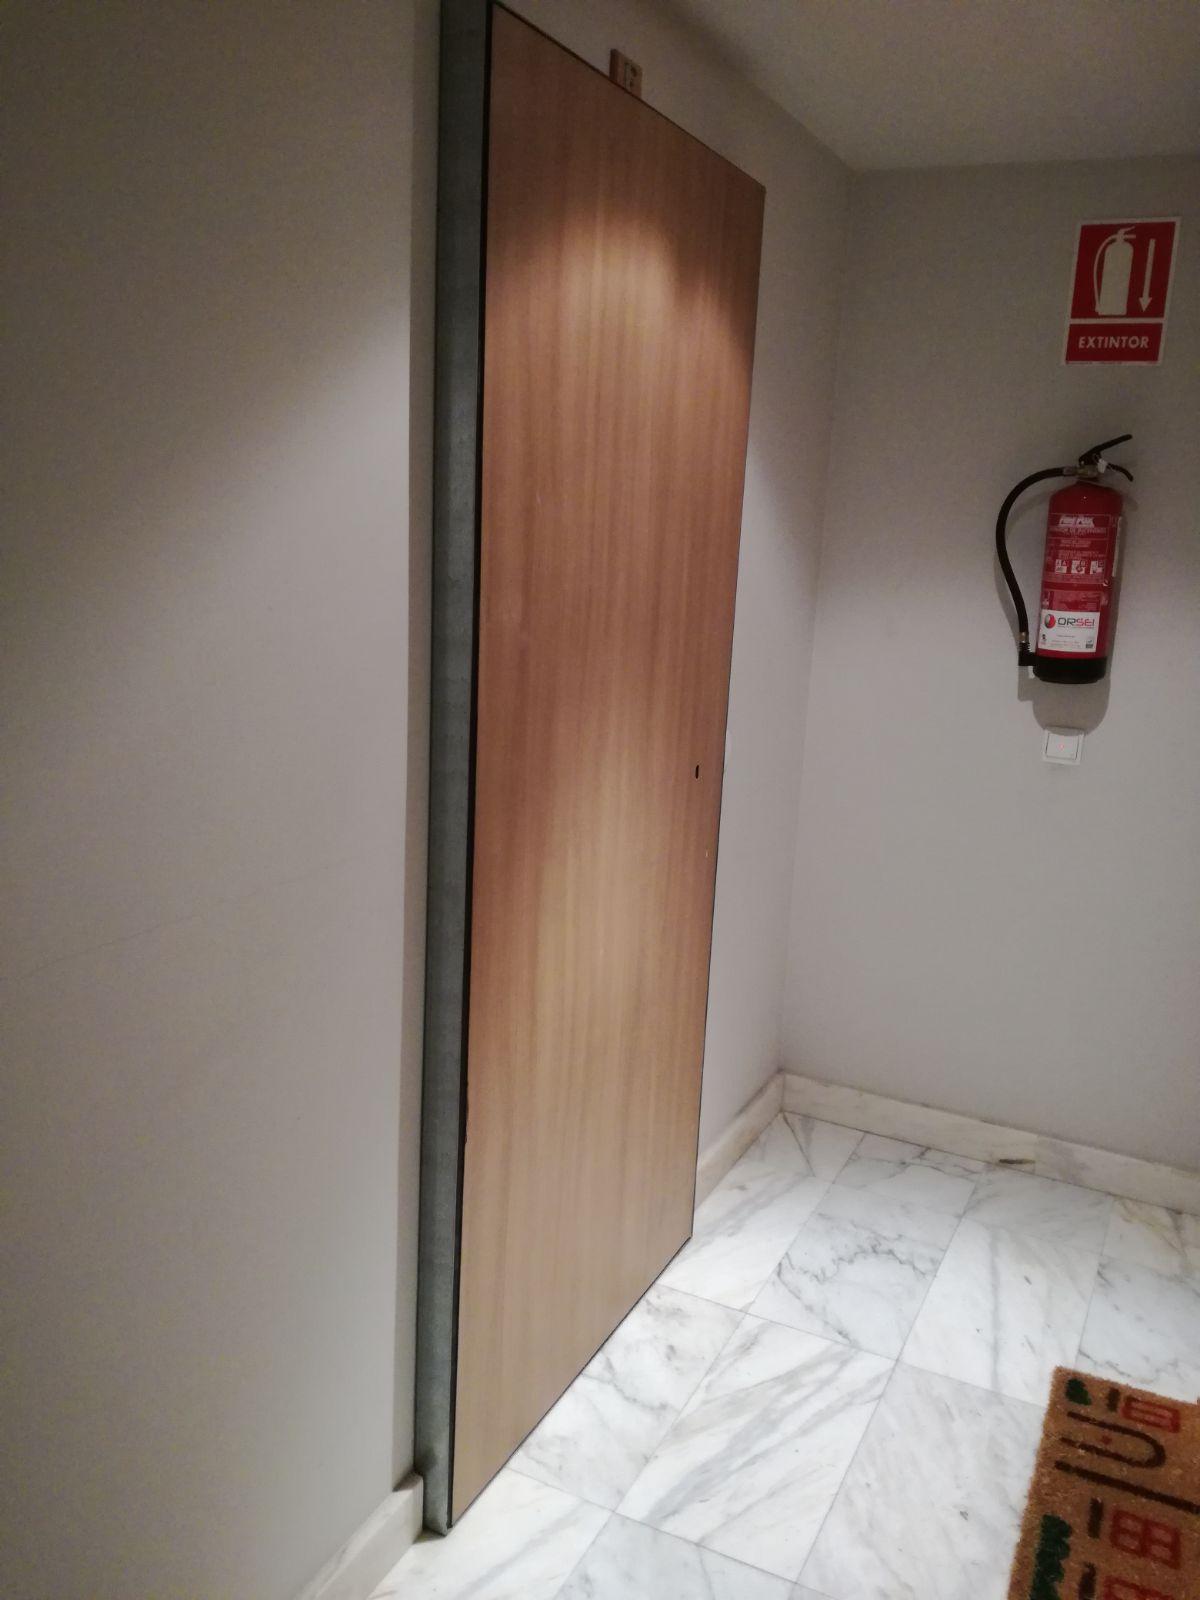 Necesitas instalar o retirar una puerta anti-okupa? - Hervill ...